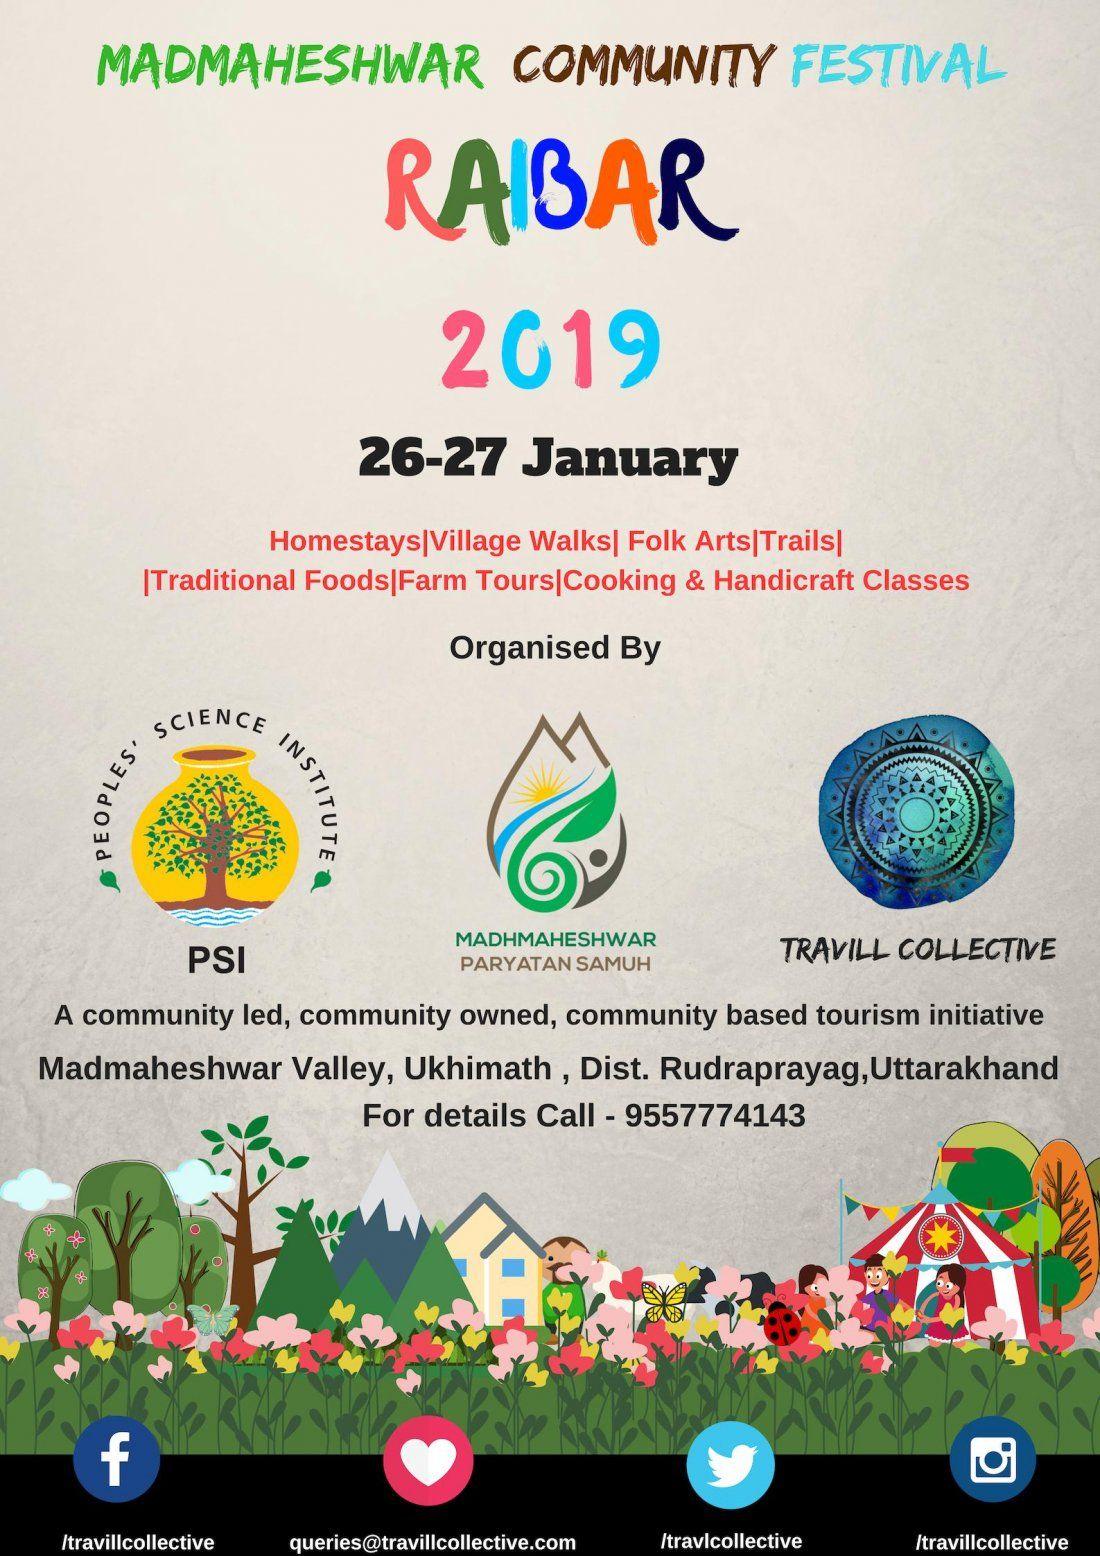 Madmaheshwar Community Festival